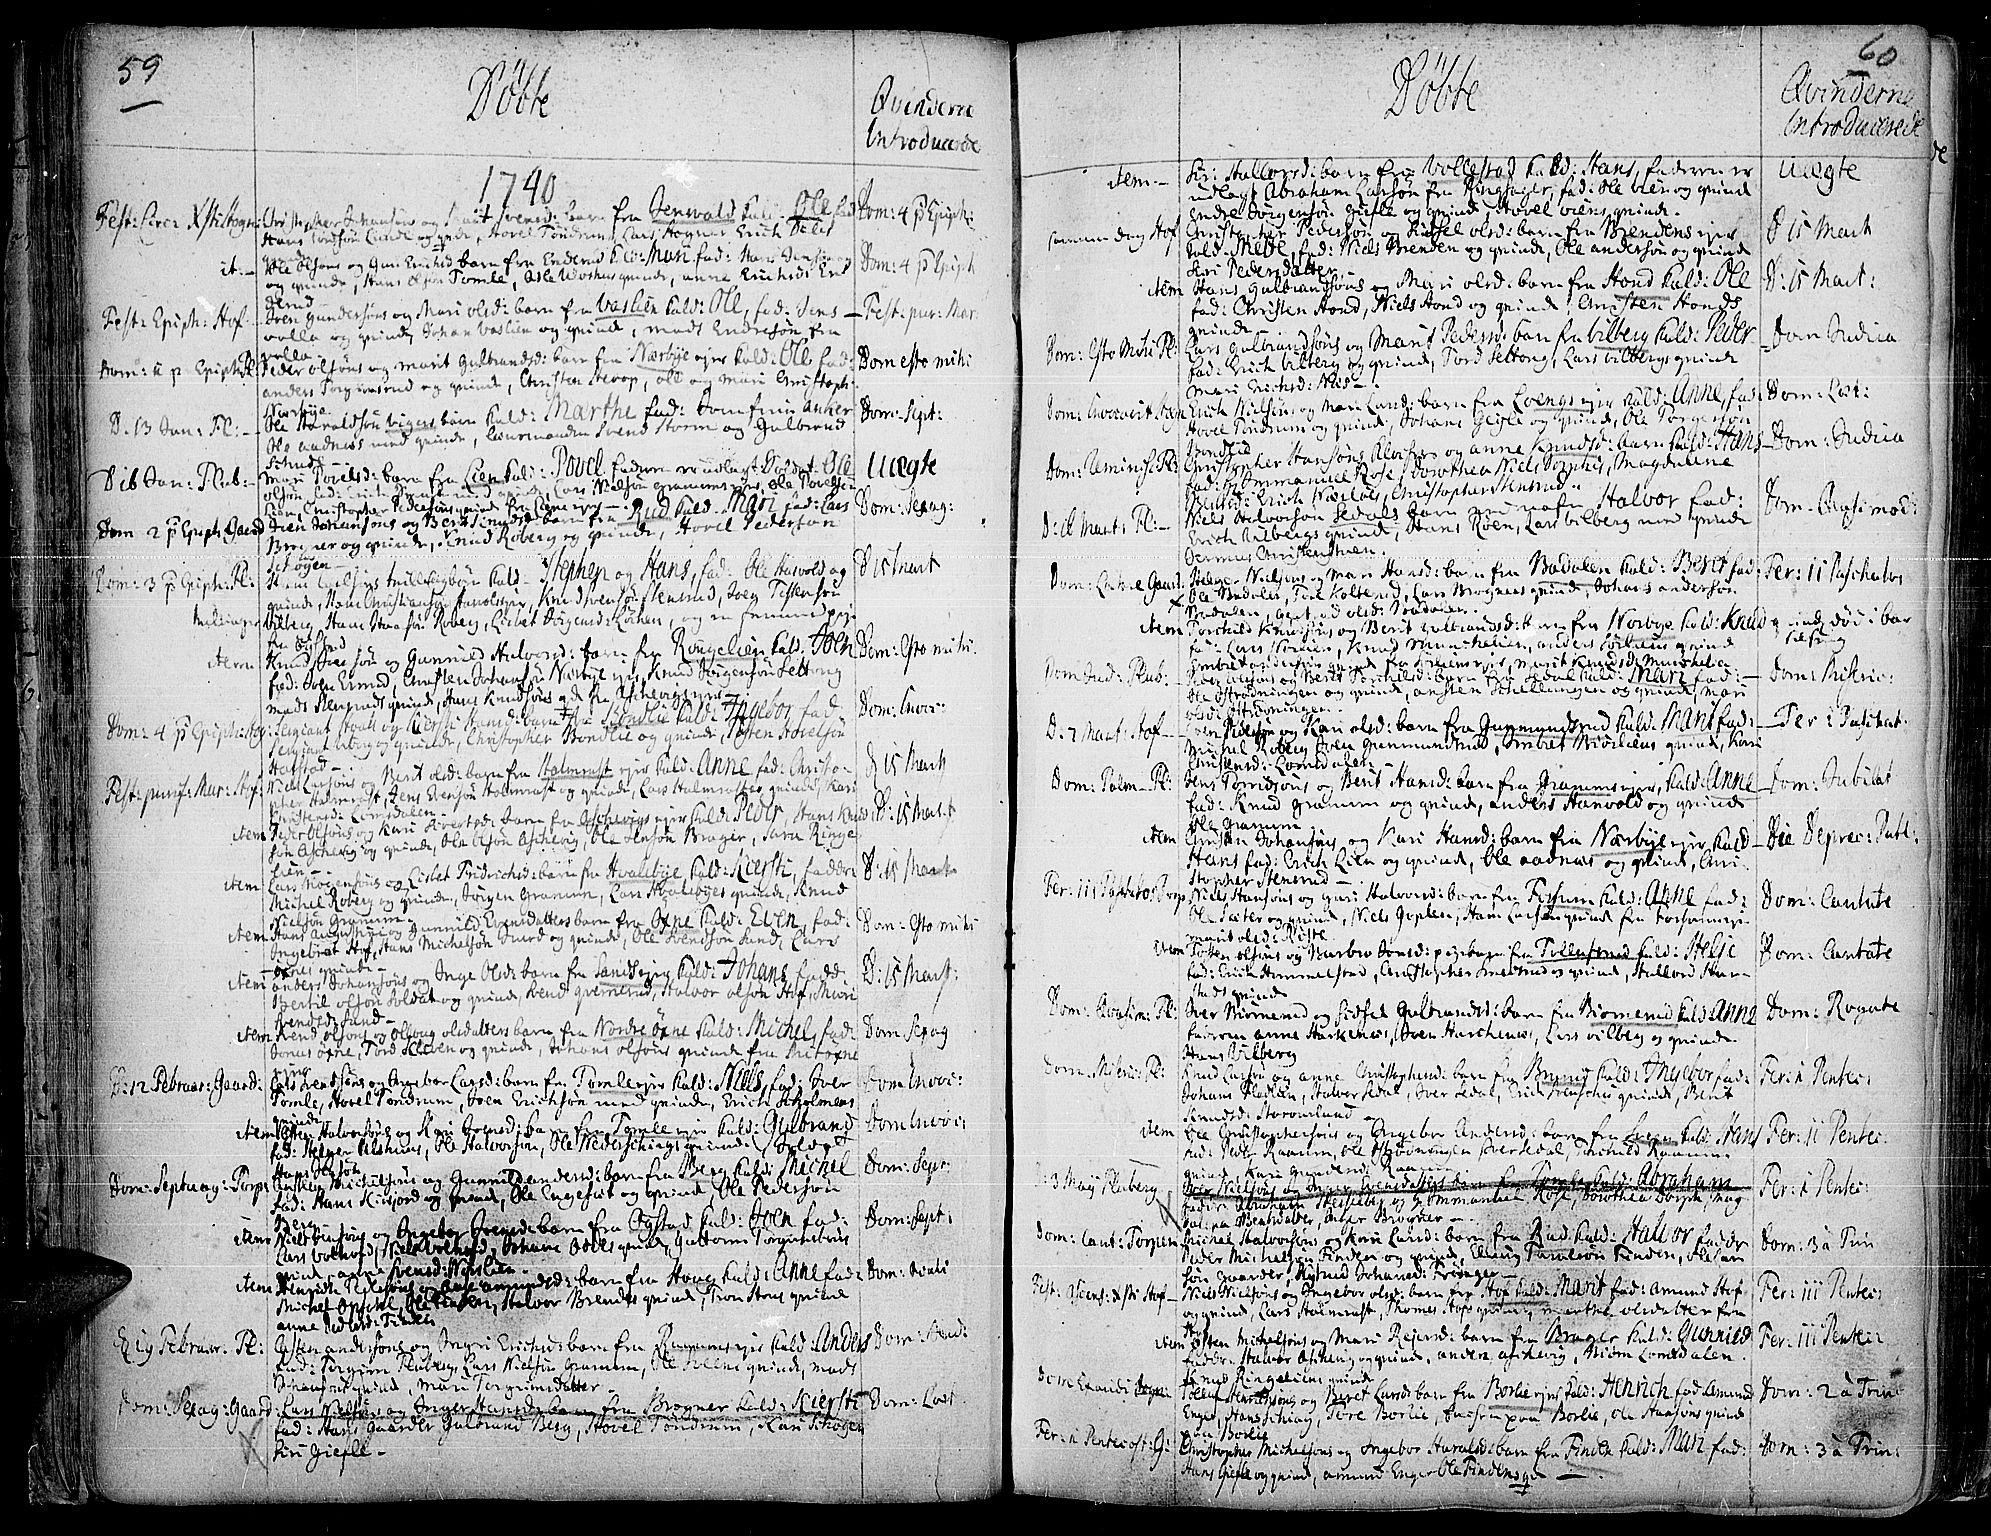 SAH, Land prestekontor, Ministerialbok nr. 2, 1733-1764, s. 59-60